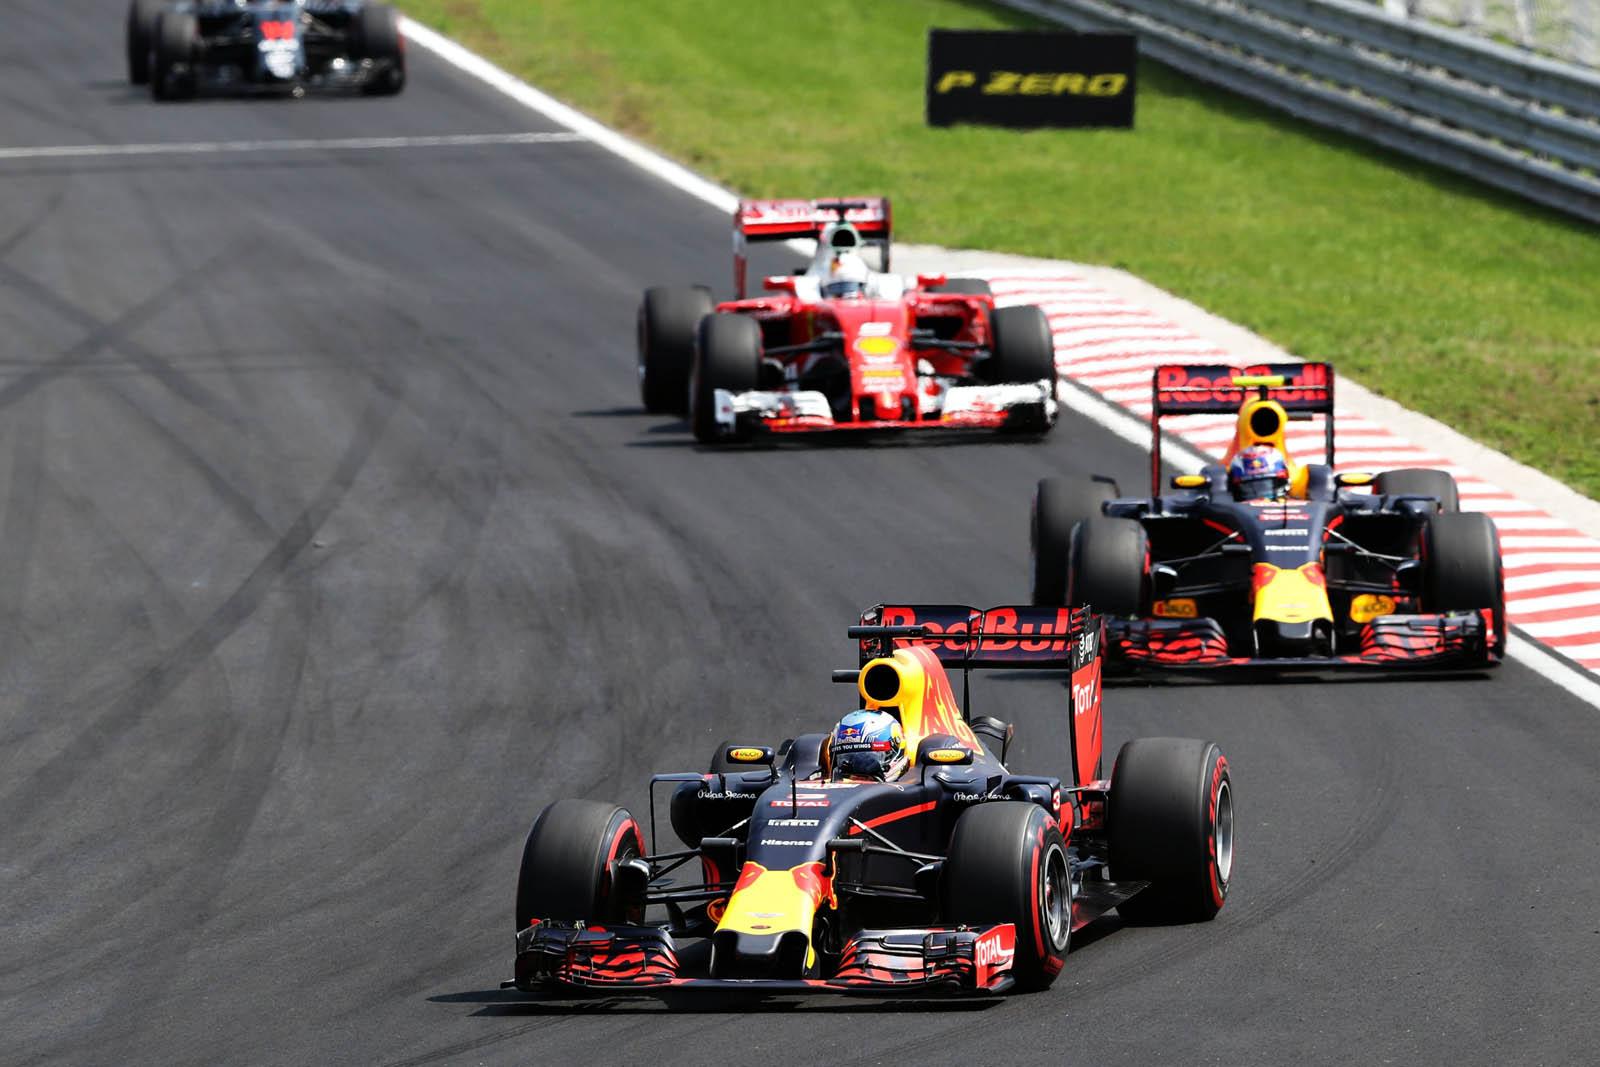 Max Verstappen Tipped To Replace Raikkonen At Ferrari